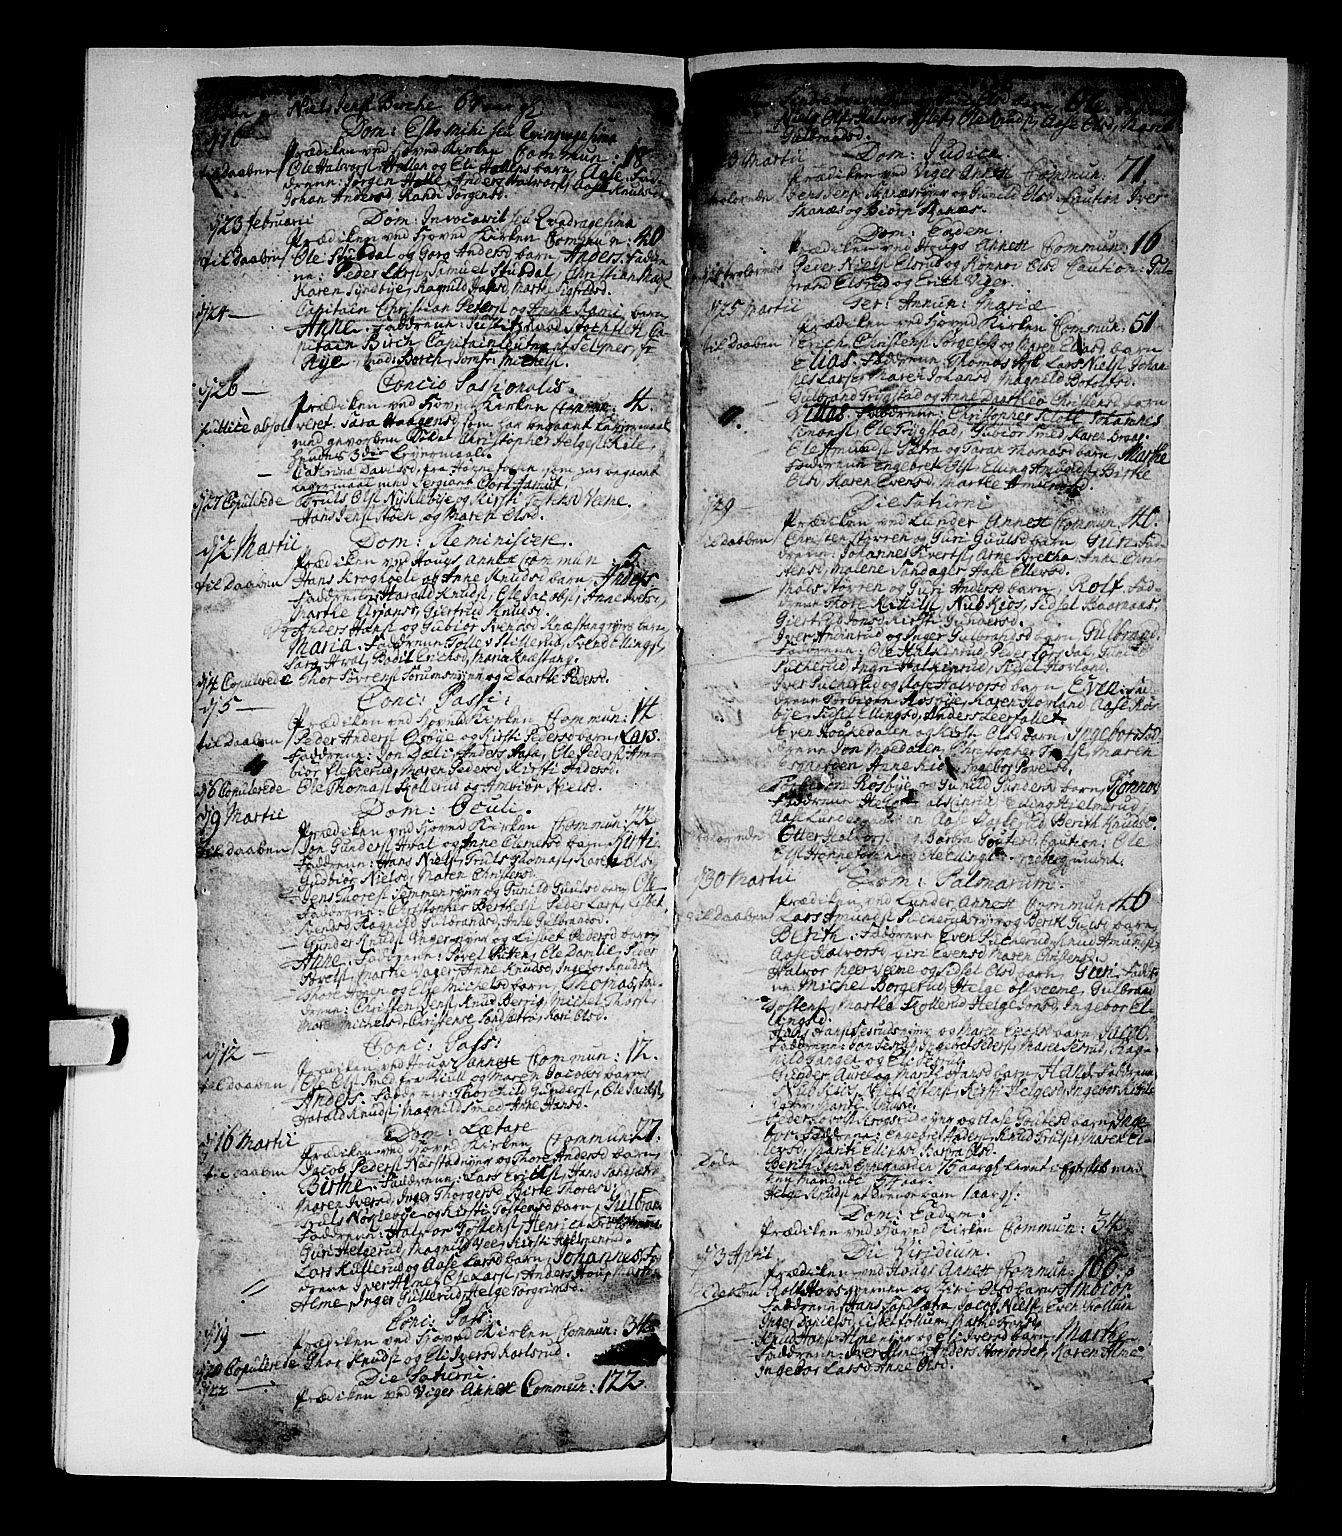 SAKO, Norderhov kirkebøker, F/Fa/L0002b: Ministerialbok nr. 2B, 1726-1739, s. 564-565